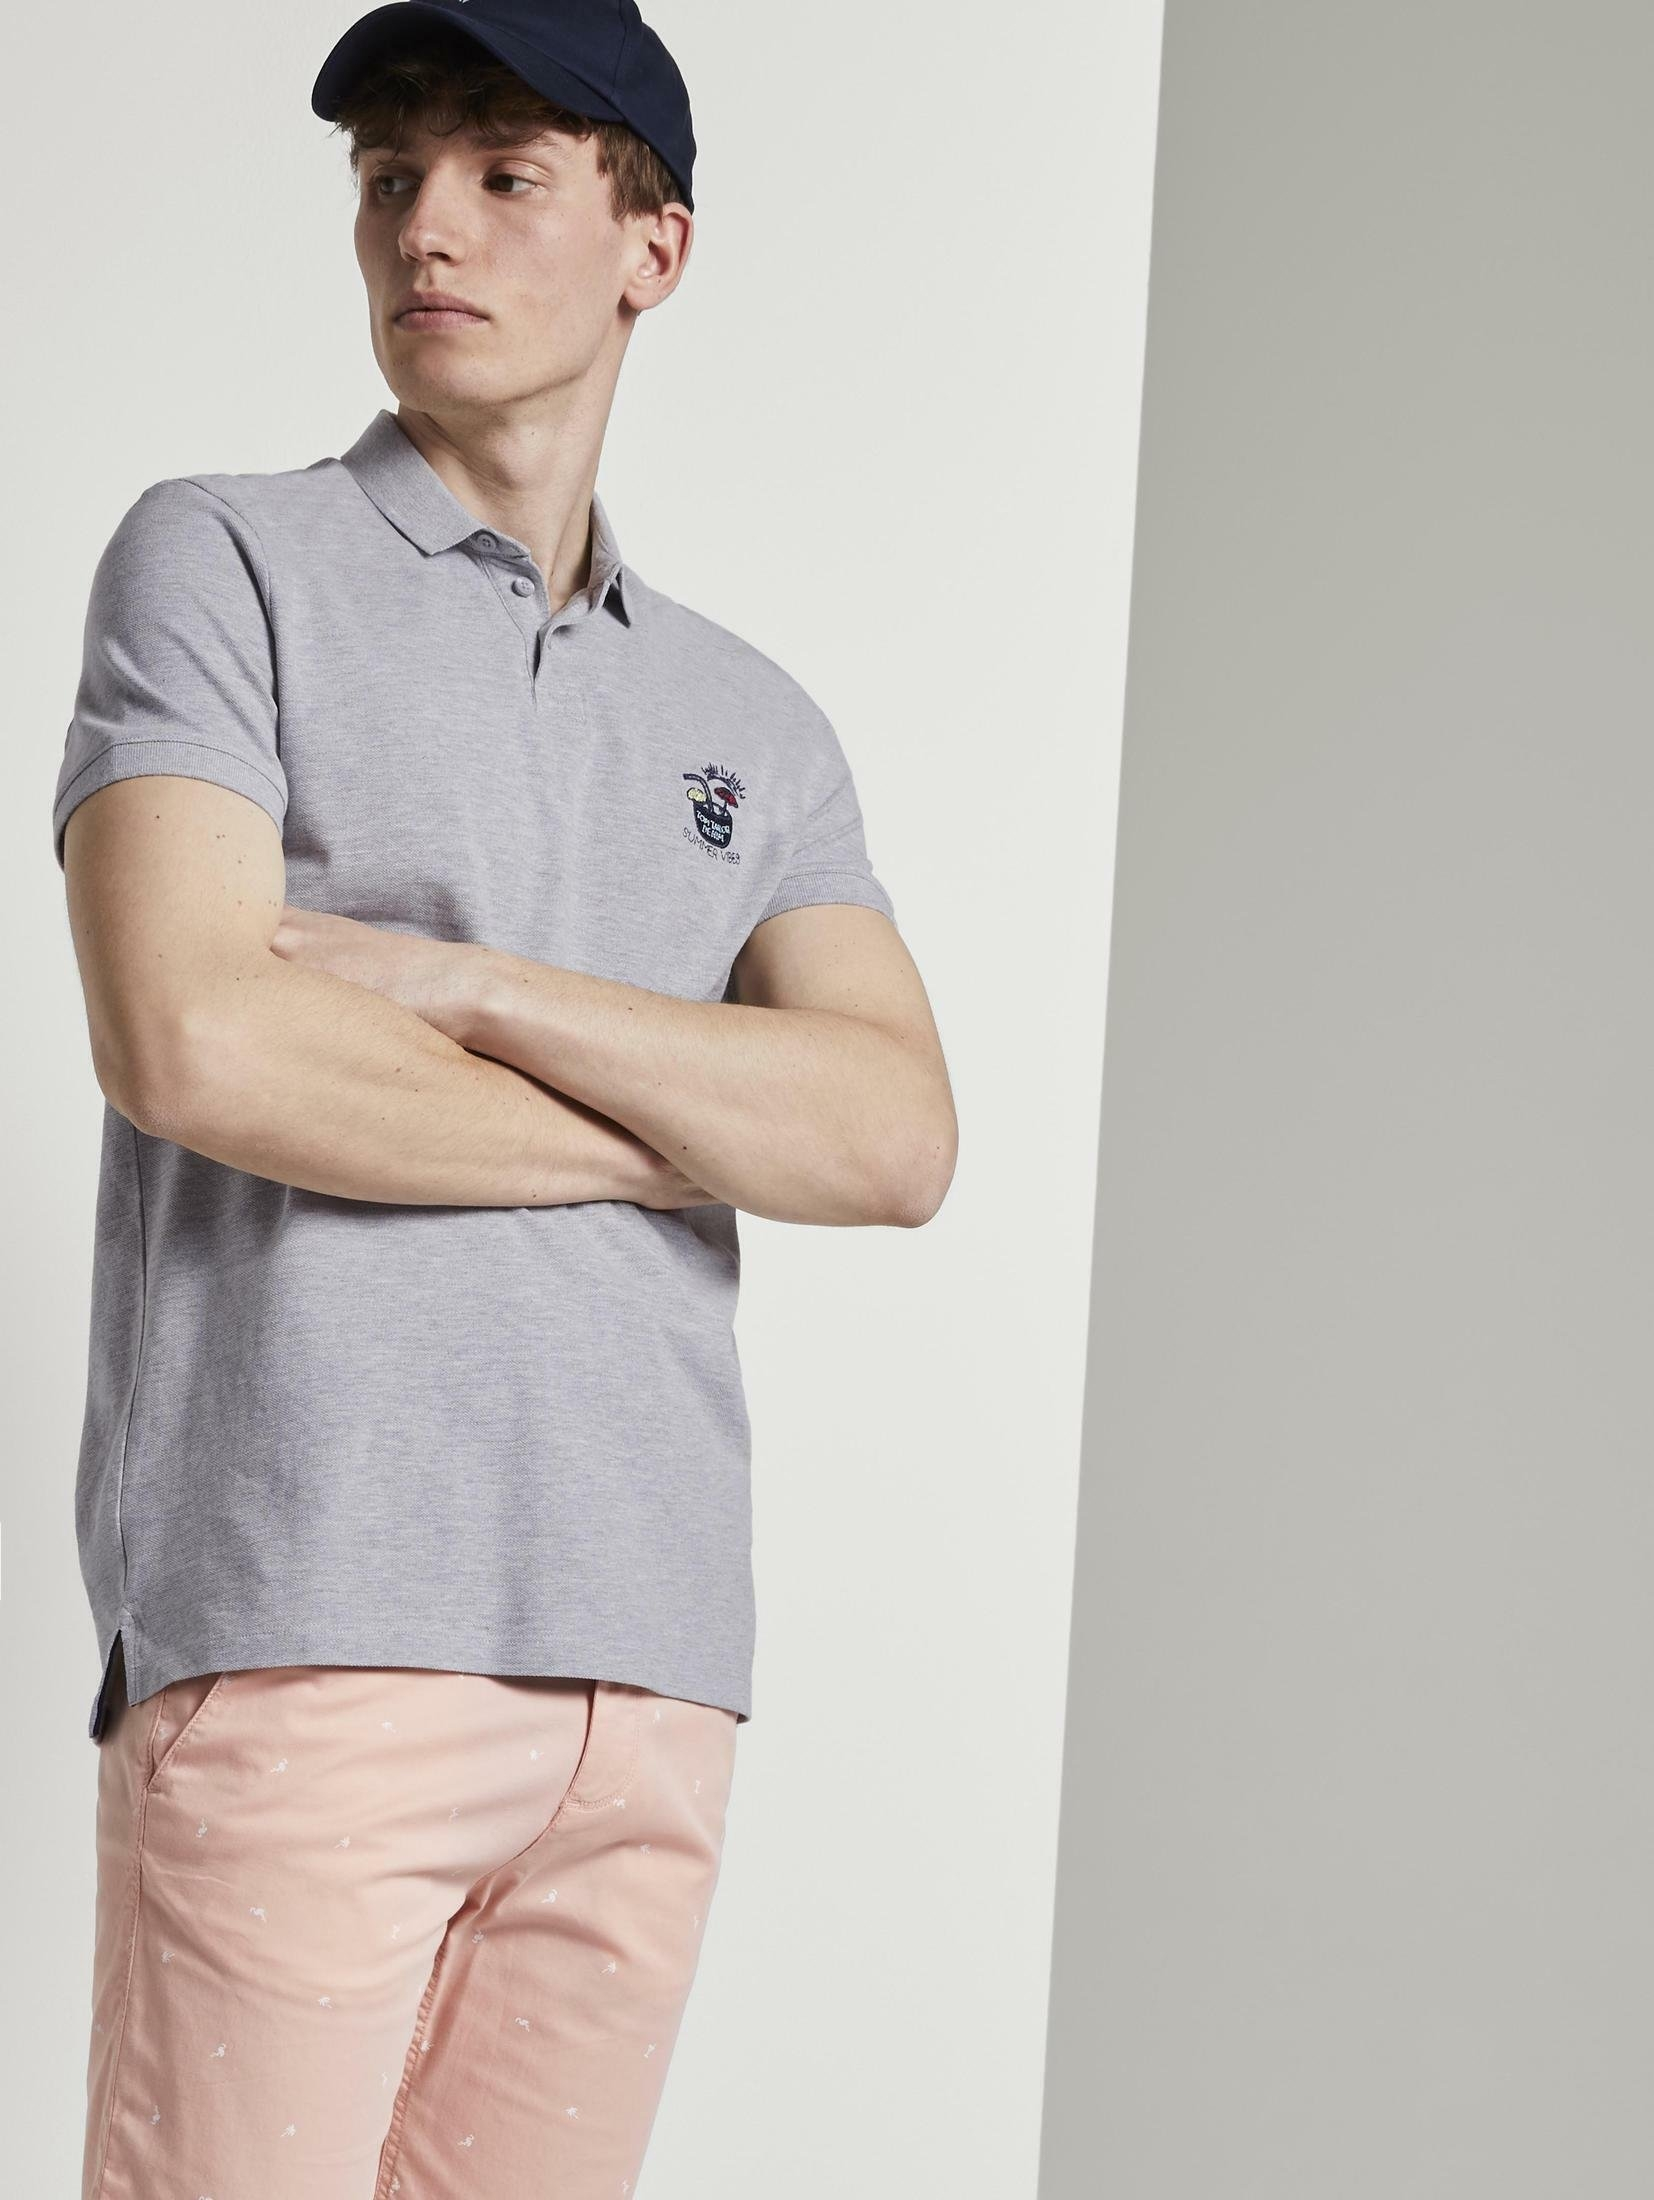 Tom Tailor Denim poloshirt »Poloshirt mit Print« bestellen: 30 dagen bedenktijd